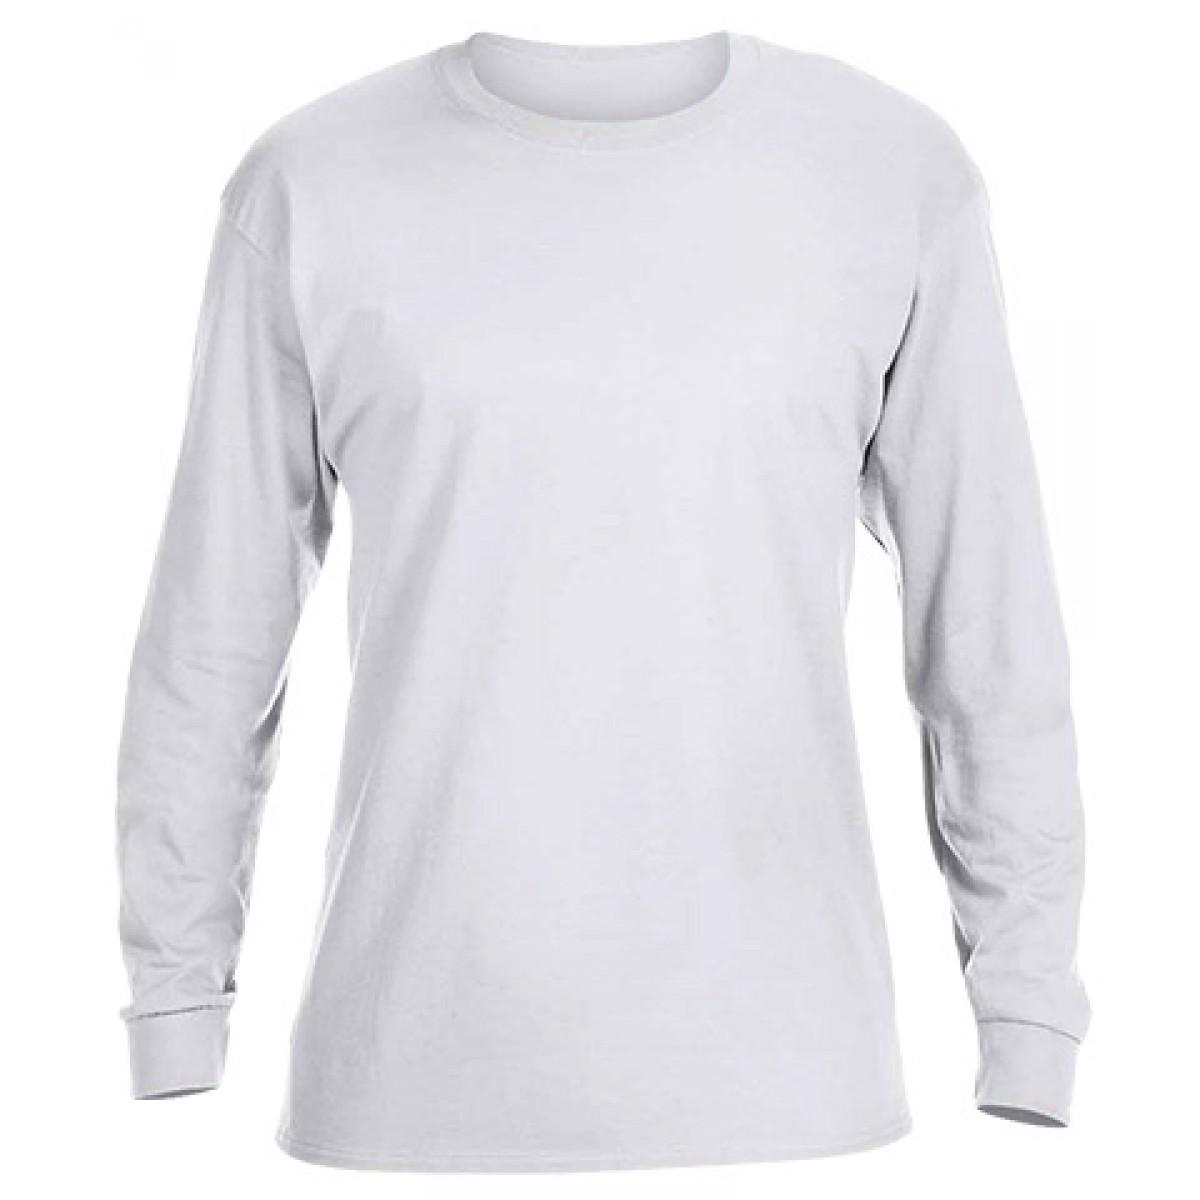 Ultra Cotton Long-Sleeve T-Shirt-White-3XL